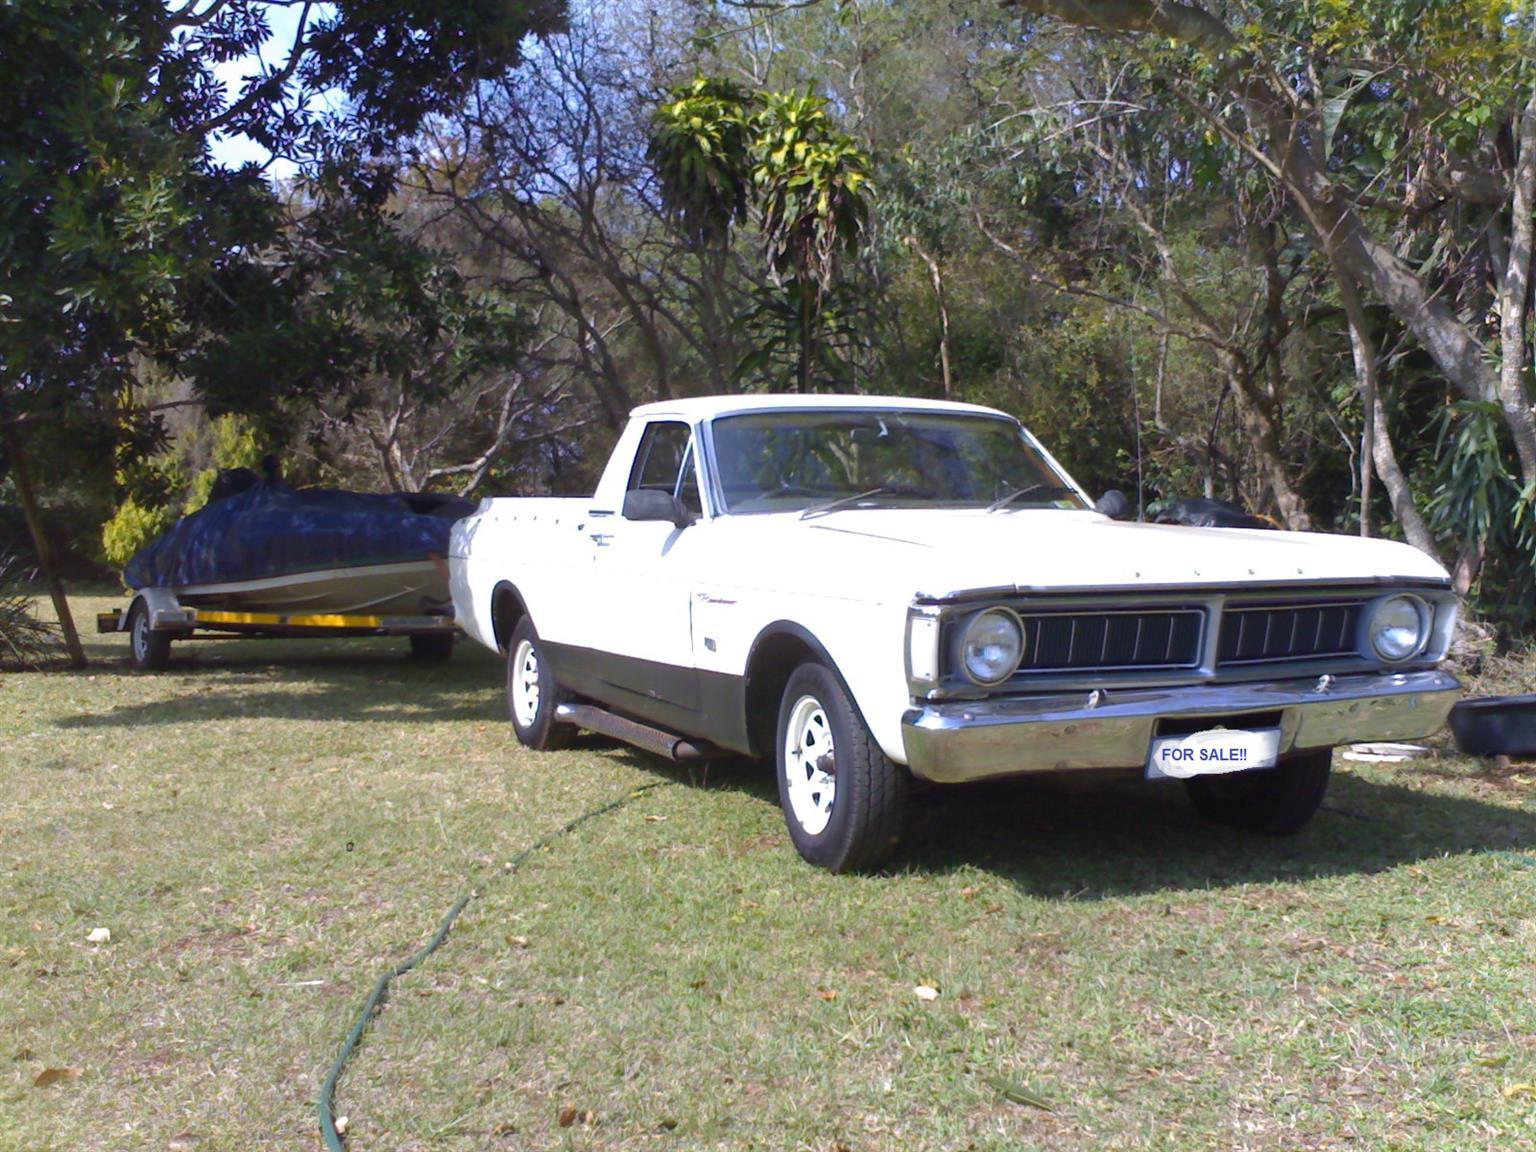 FORD Ranchero 1972 - 302 V8 UTE Bakkie XY Farmont GT shape -Classic / Muscle Car/Bakkie All-in-1